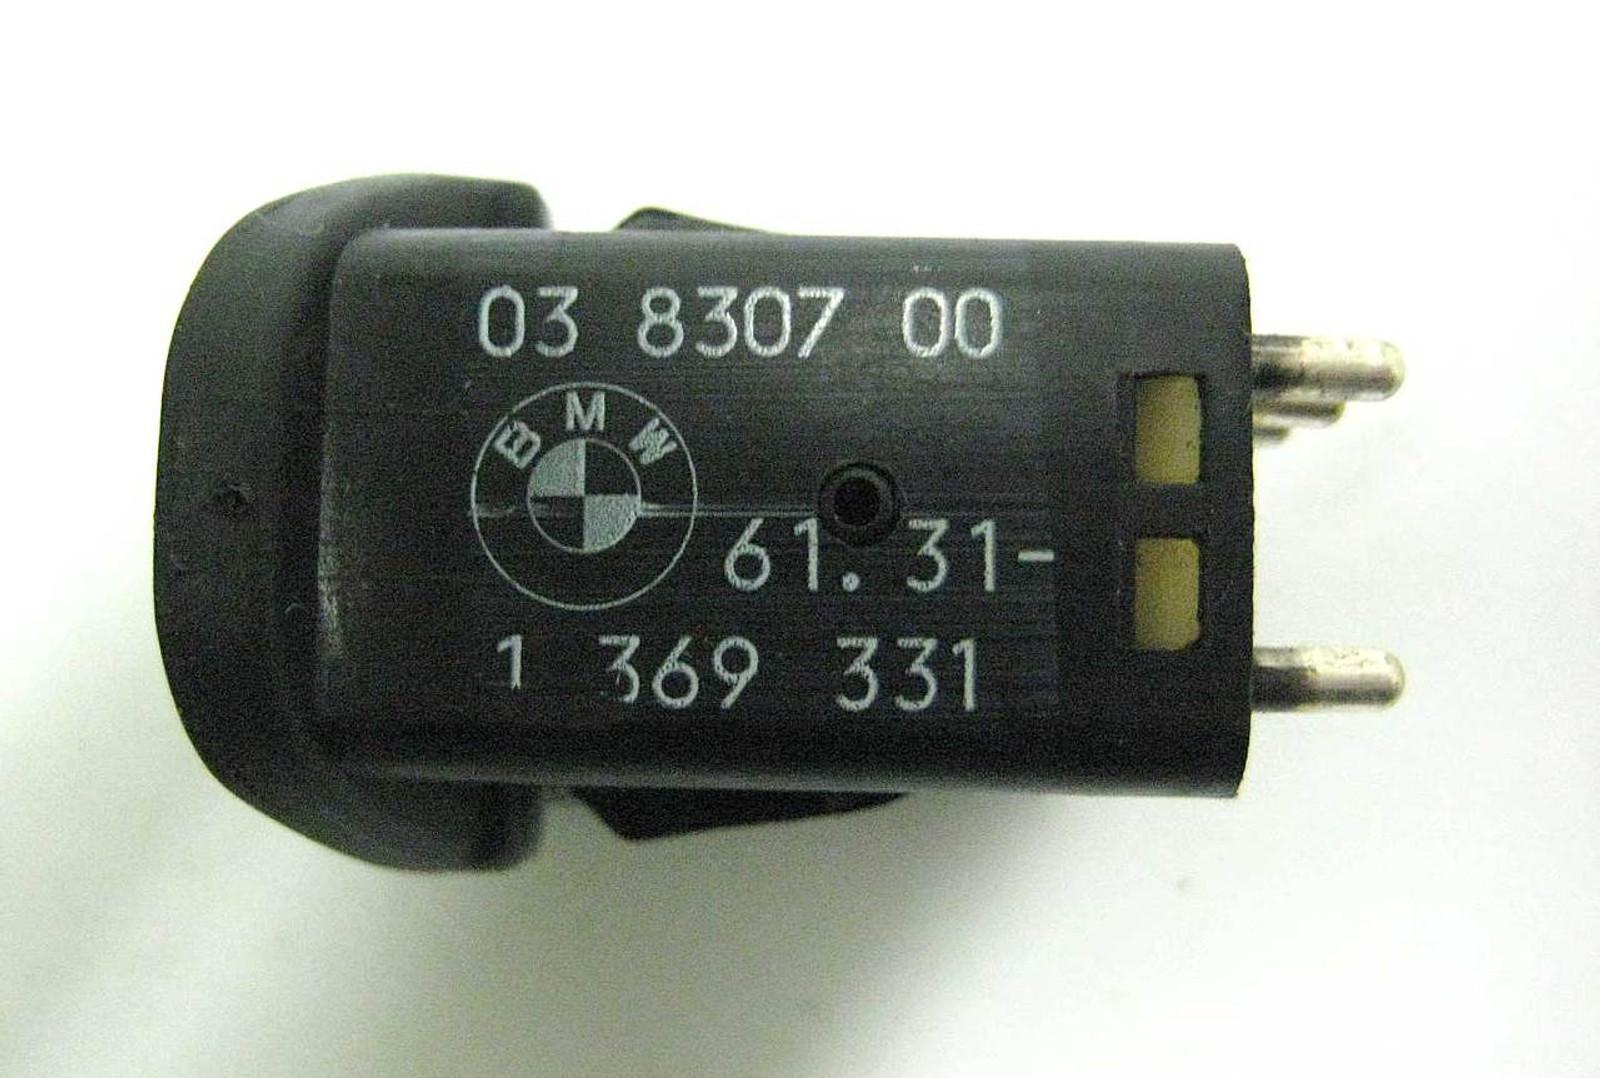 Bmw Power Mirror Adjustment Switch 1983 2002 E30 E24 E32 E34 318ti M30 Wiring Diagram Previous